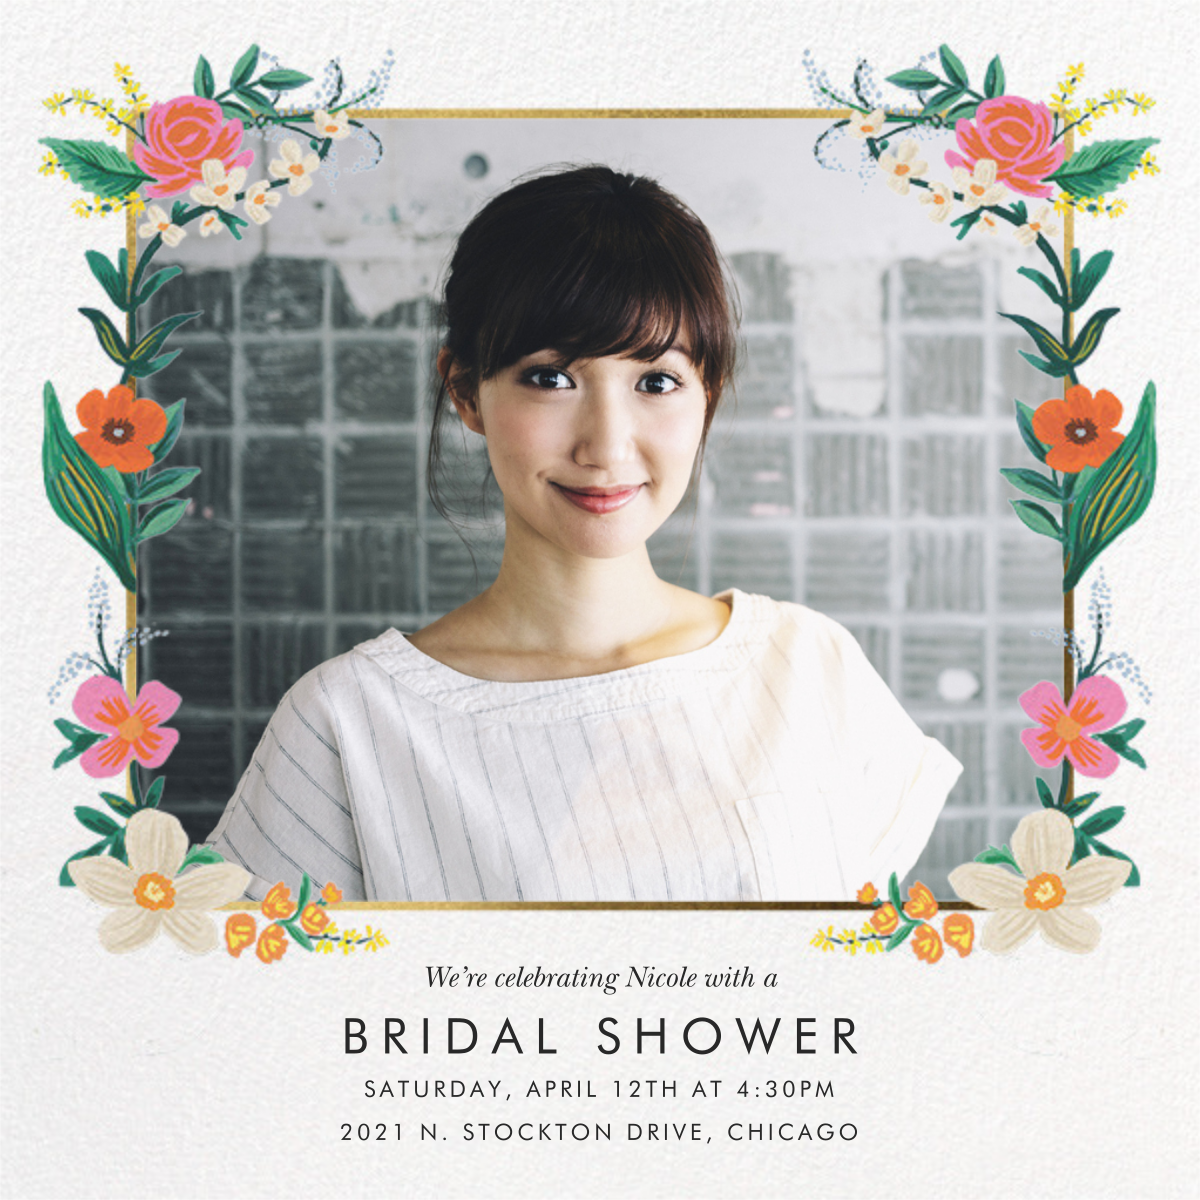 Orangerie (Square) - White - Rifle Paper Co. - Bridal shower